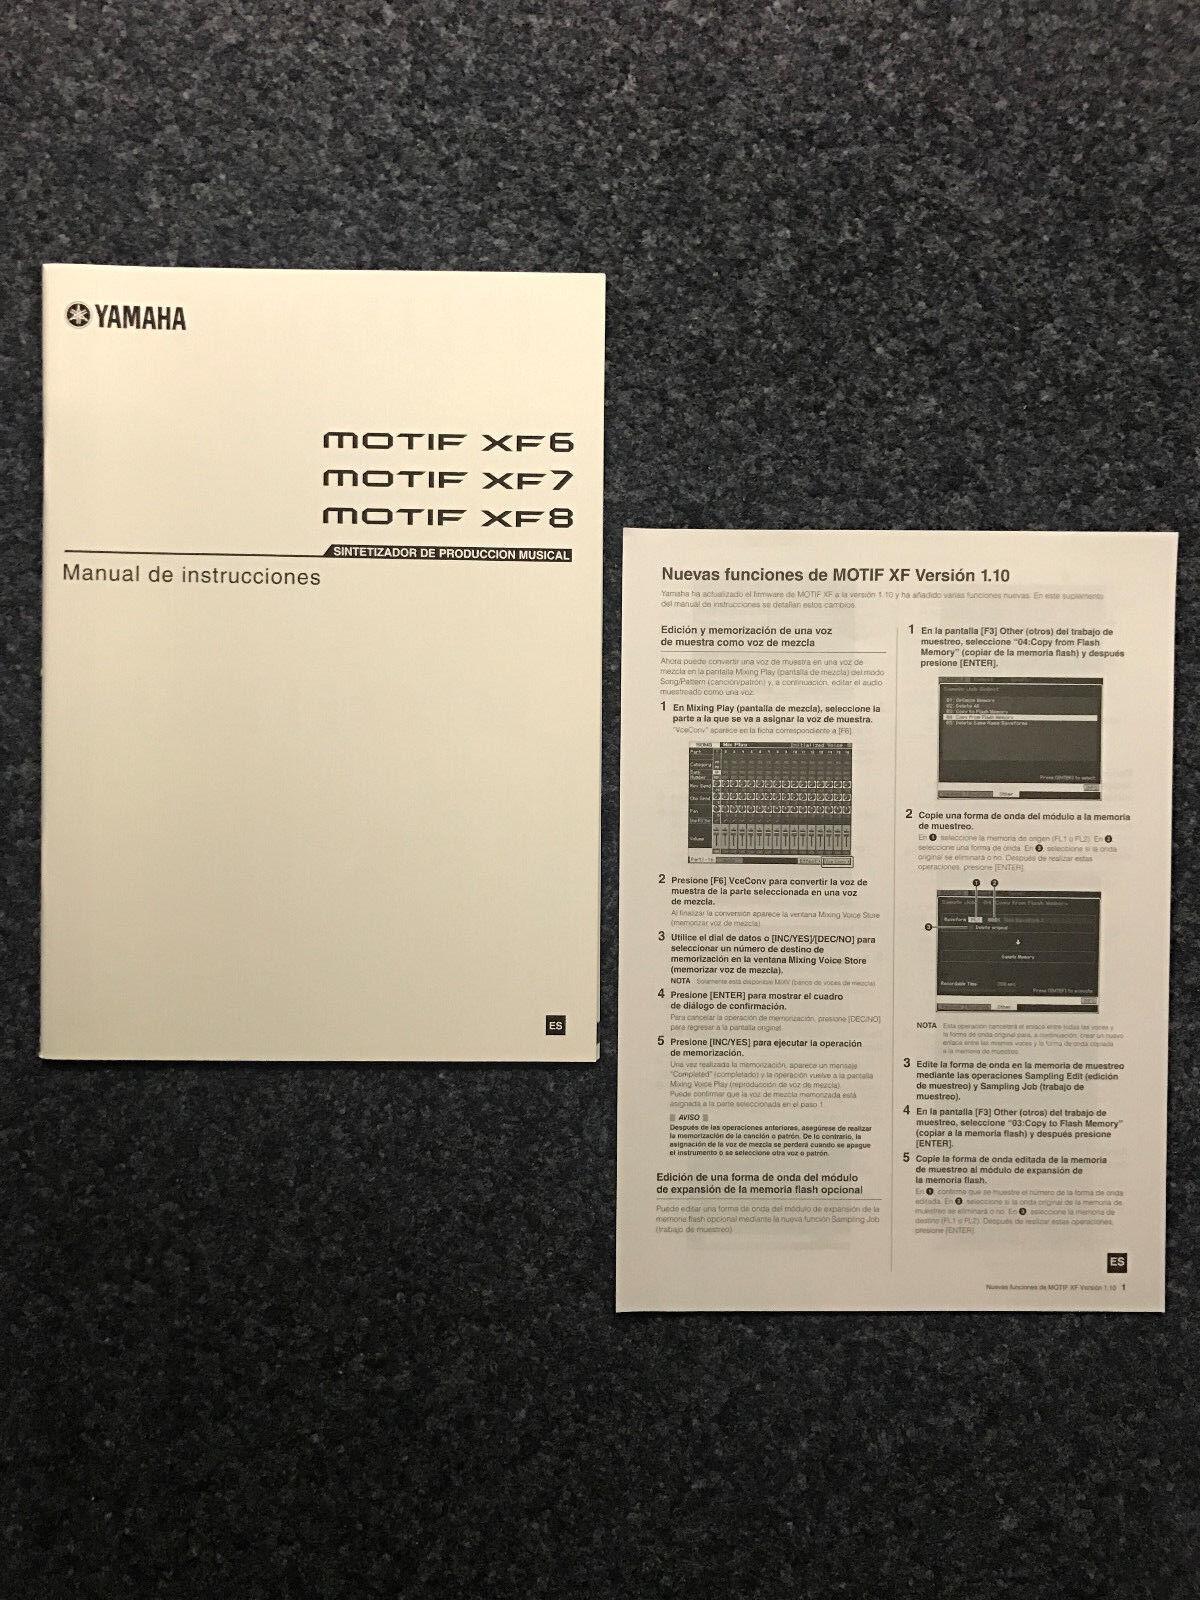 Yamaha   MOTIF   XF6 XF7 XF8   New Production SyntheGrößer   Instrucciones   ES